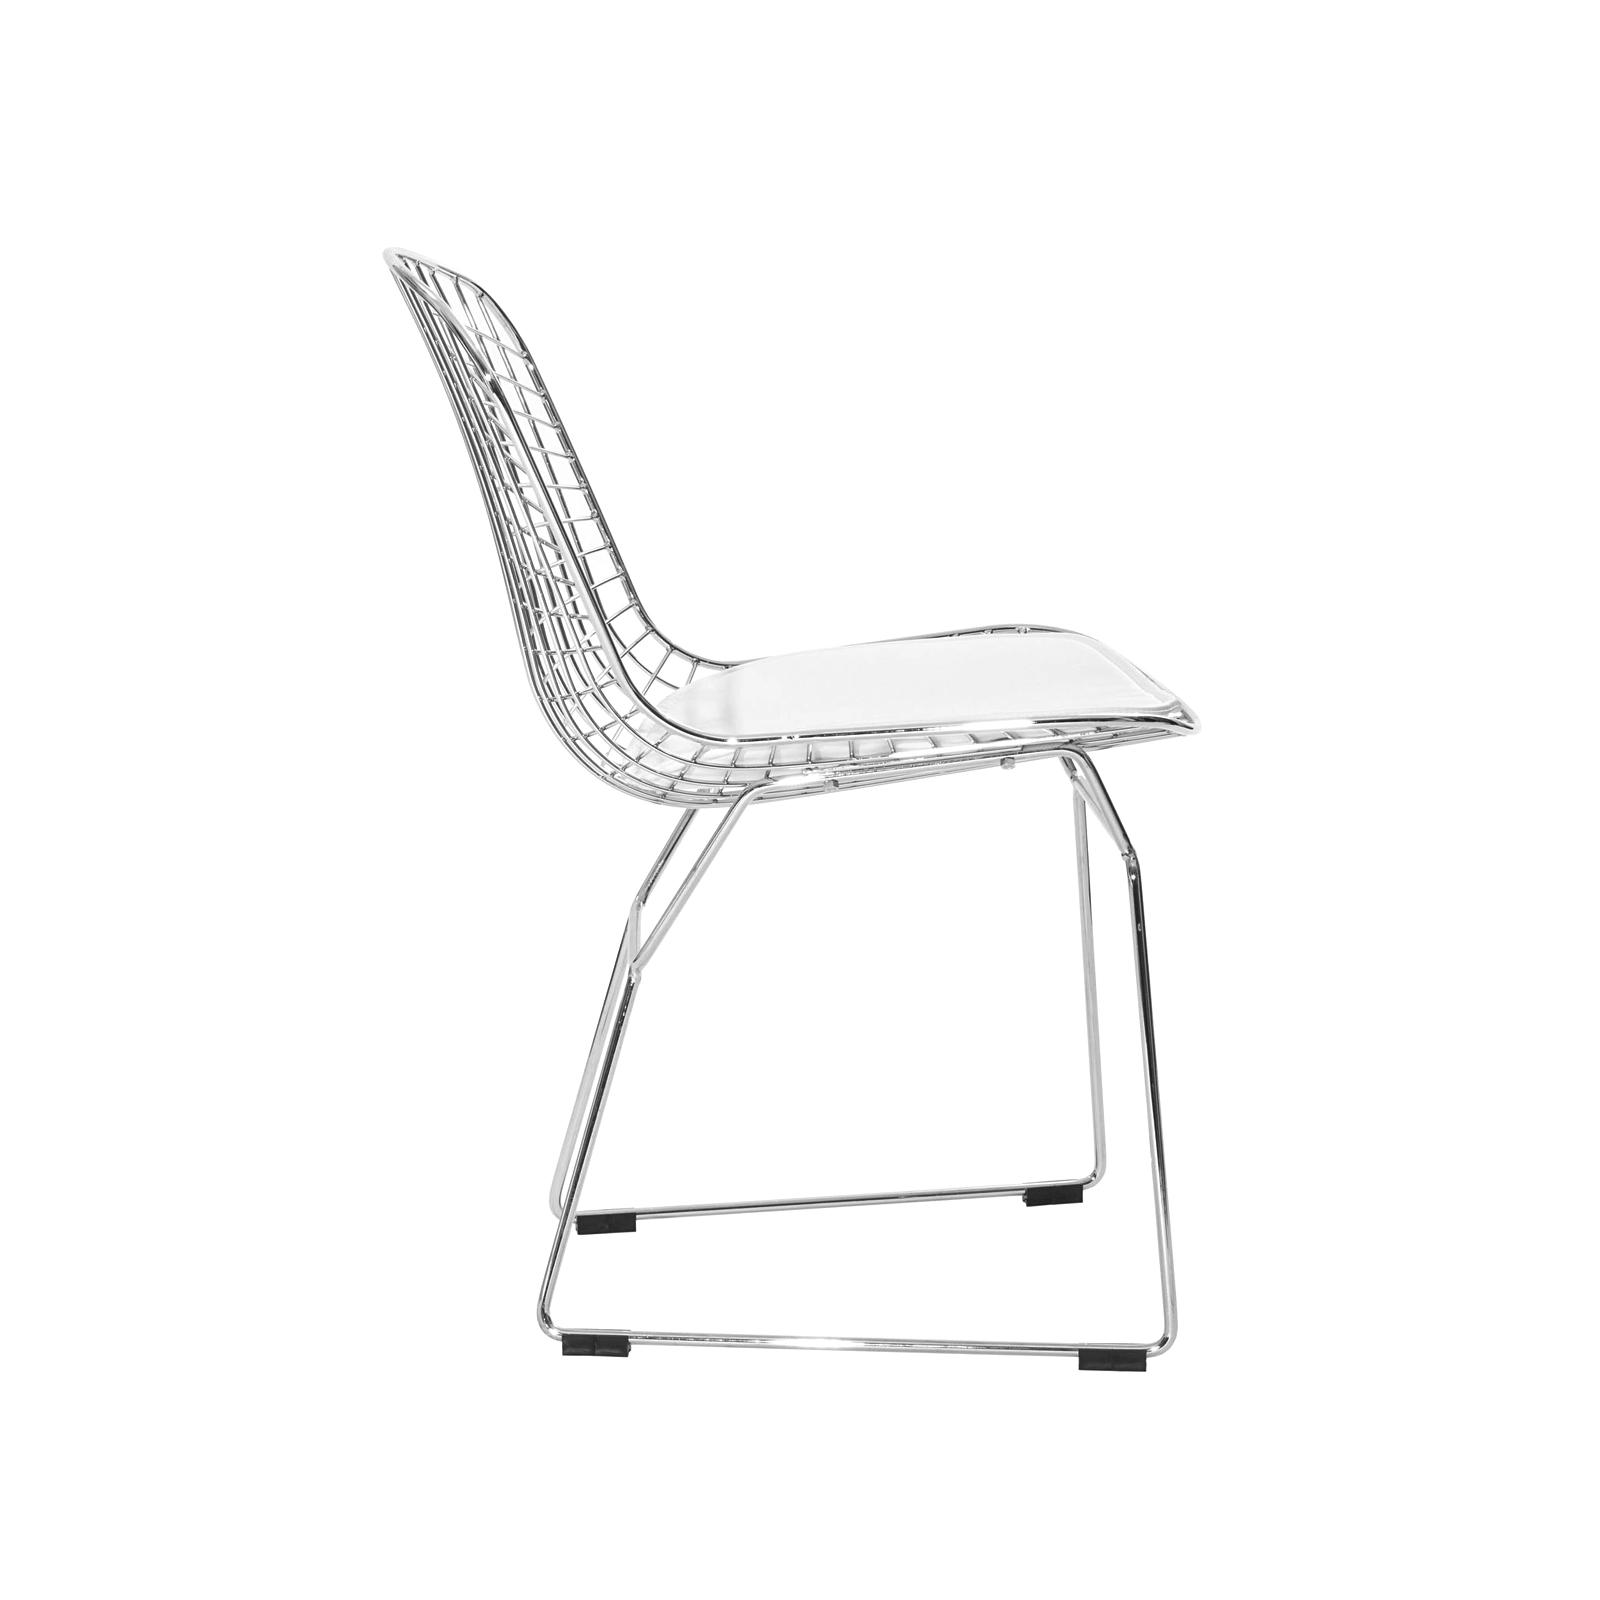 Bertoia side chair white -  C10459 00 Bertoia Side Chair Rental Profile